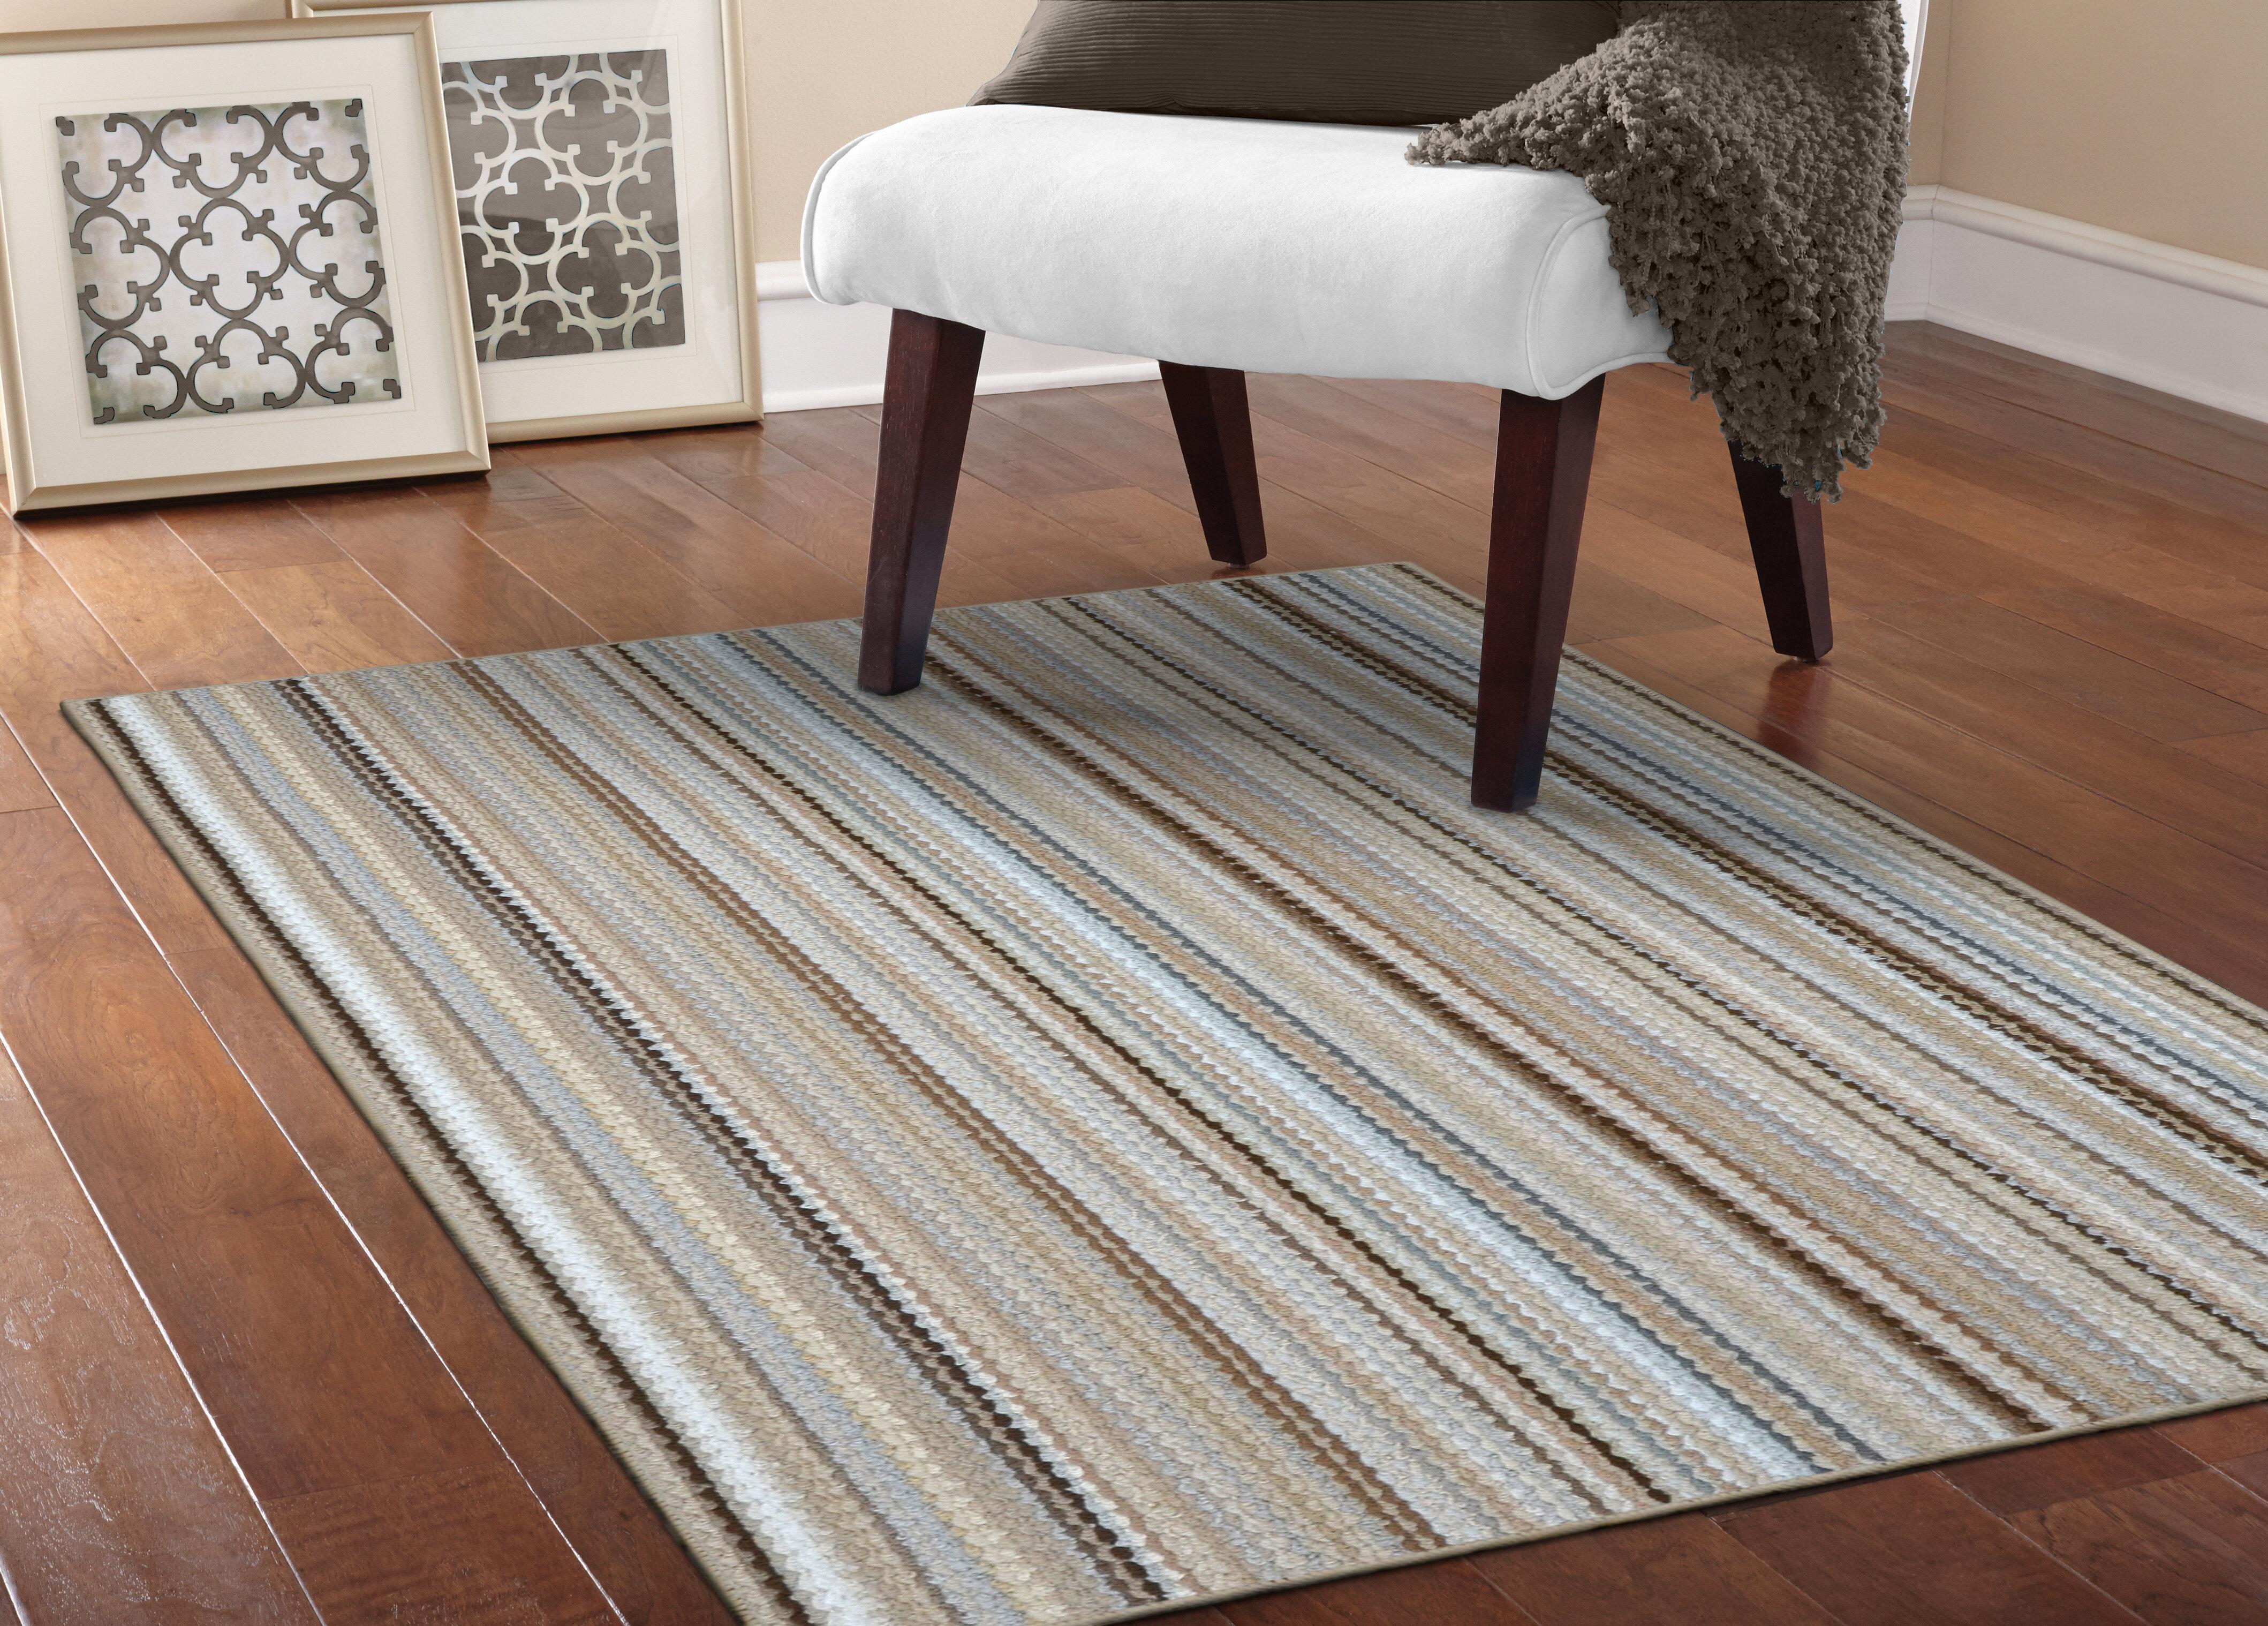 cowhide ann watch dorm youtube rugs decor inspired rug le home diy